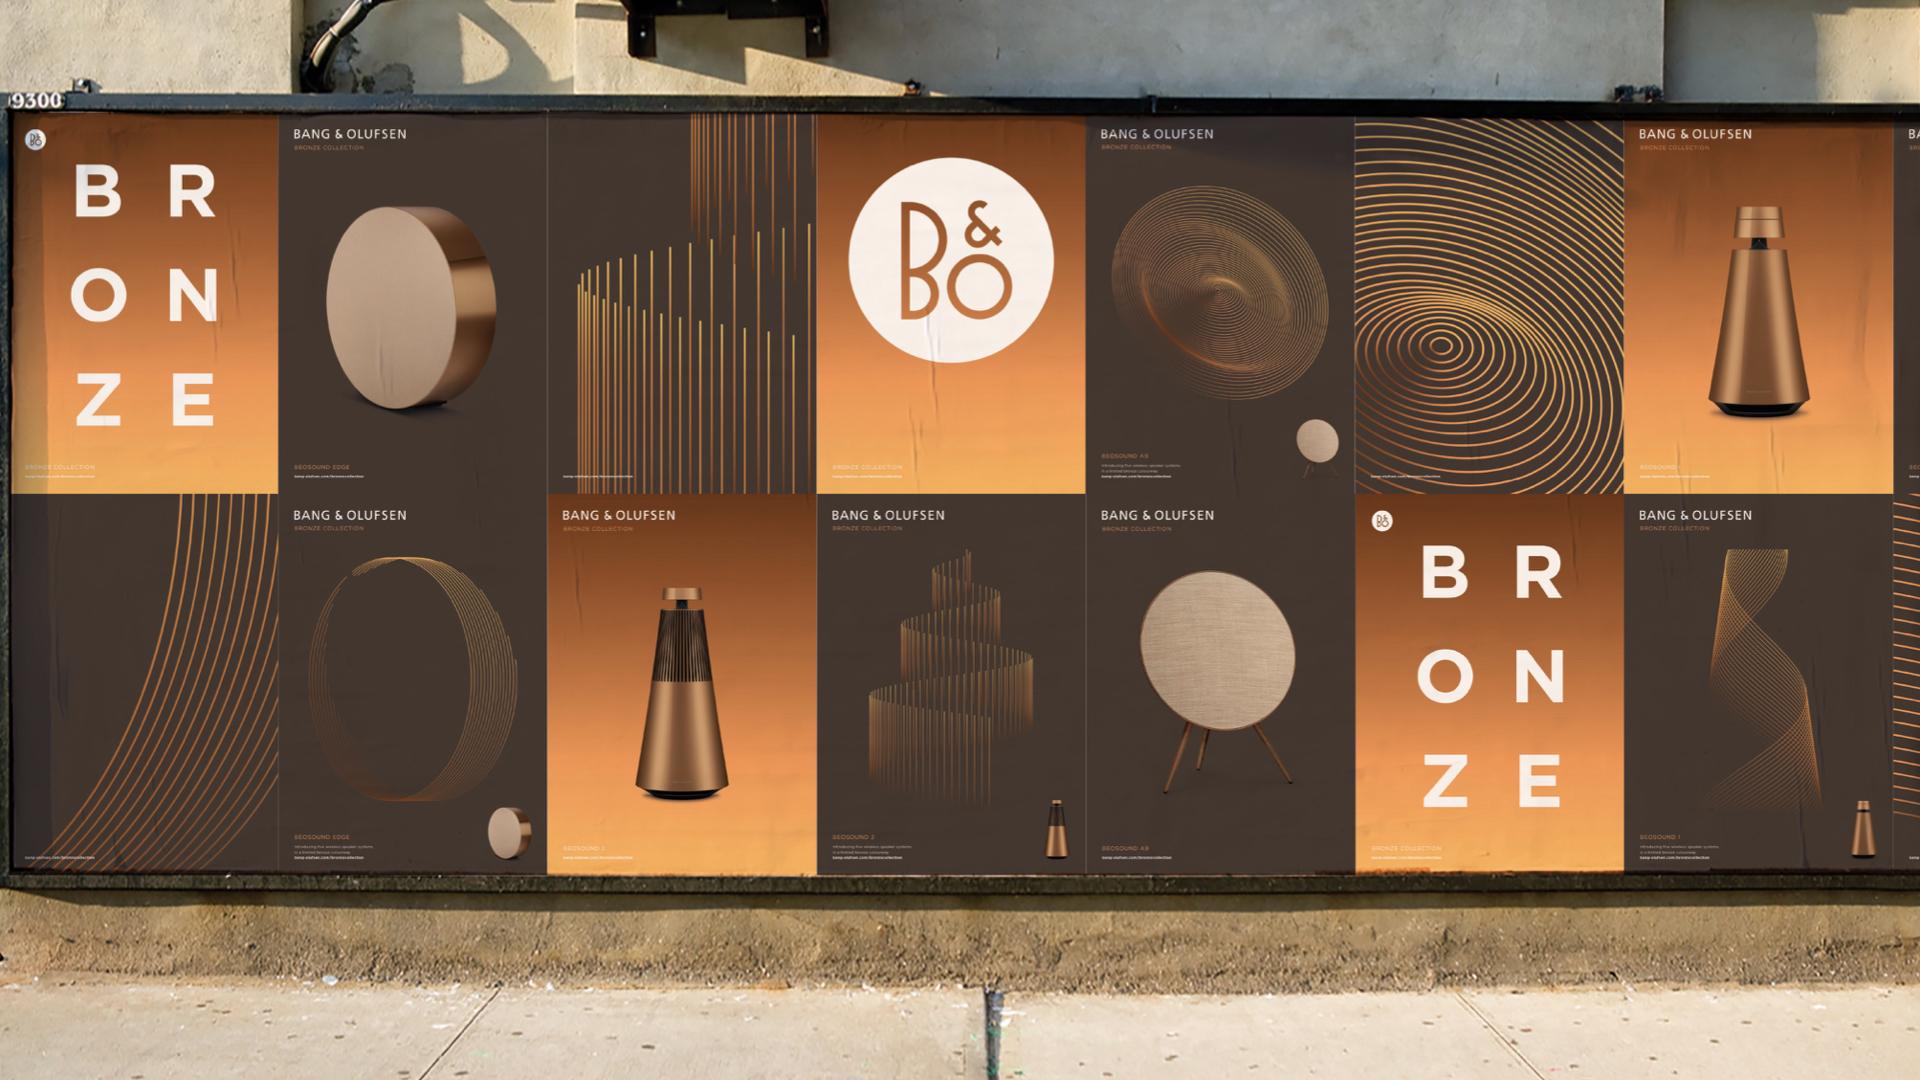 LDN_Bang+Olufsen_Creds Deck.006.jpeg